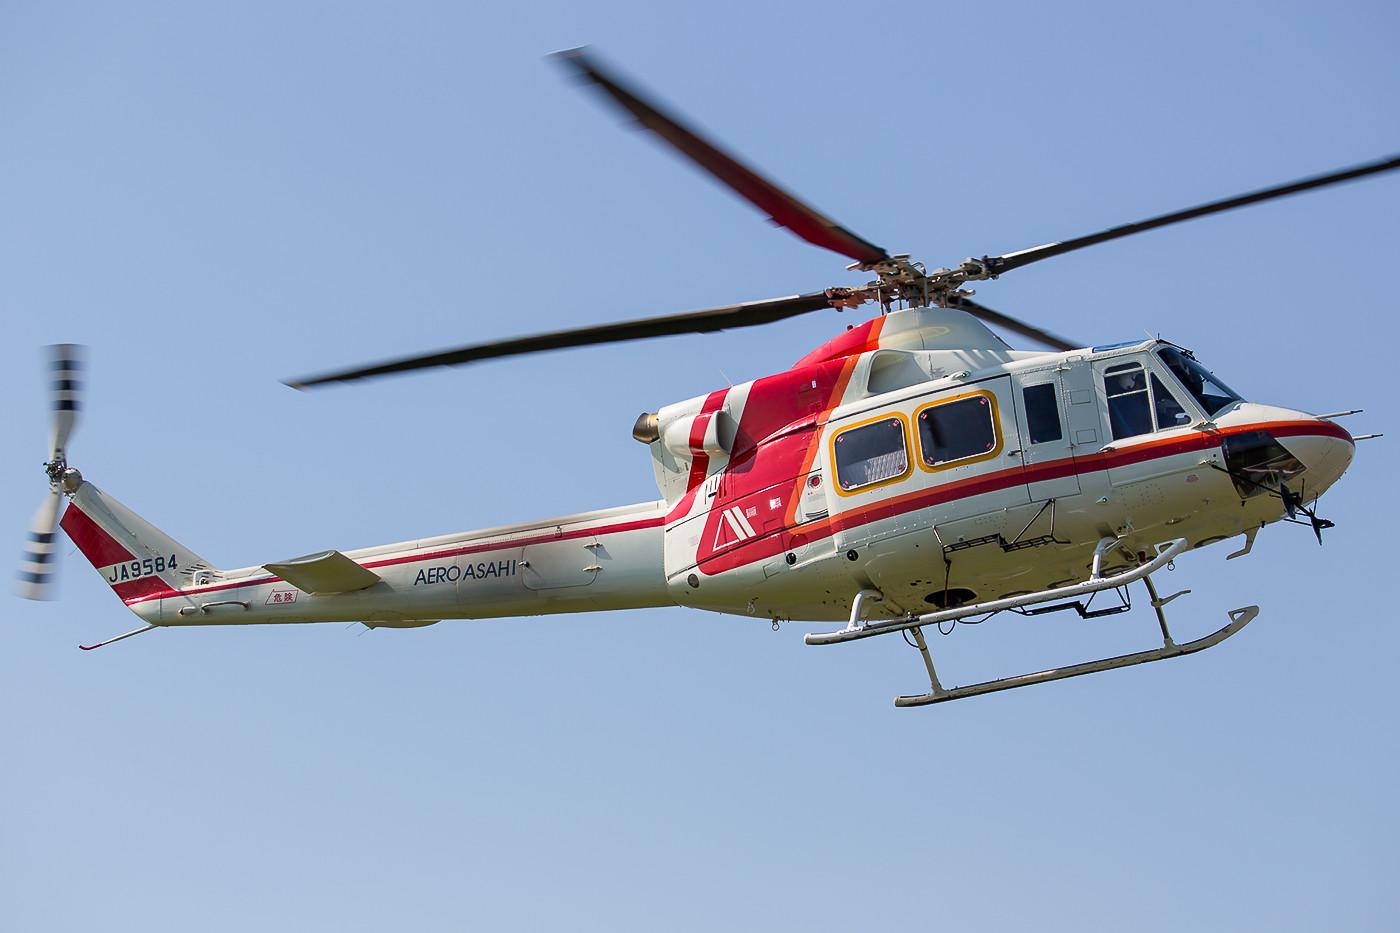 Bell-412 der Aero Asahi